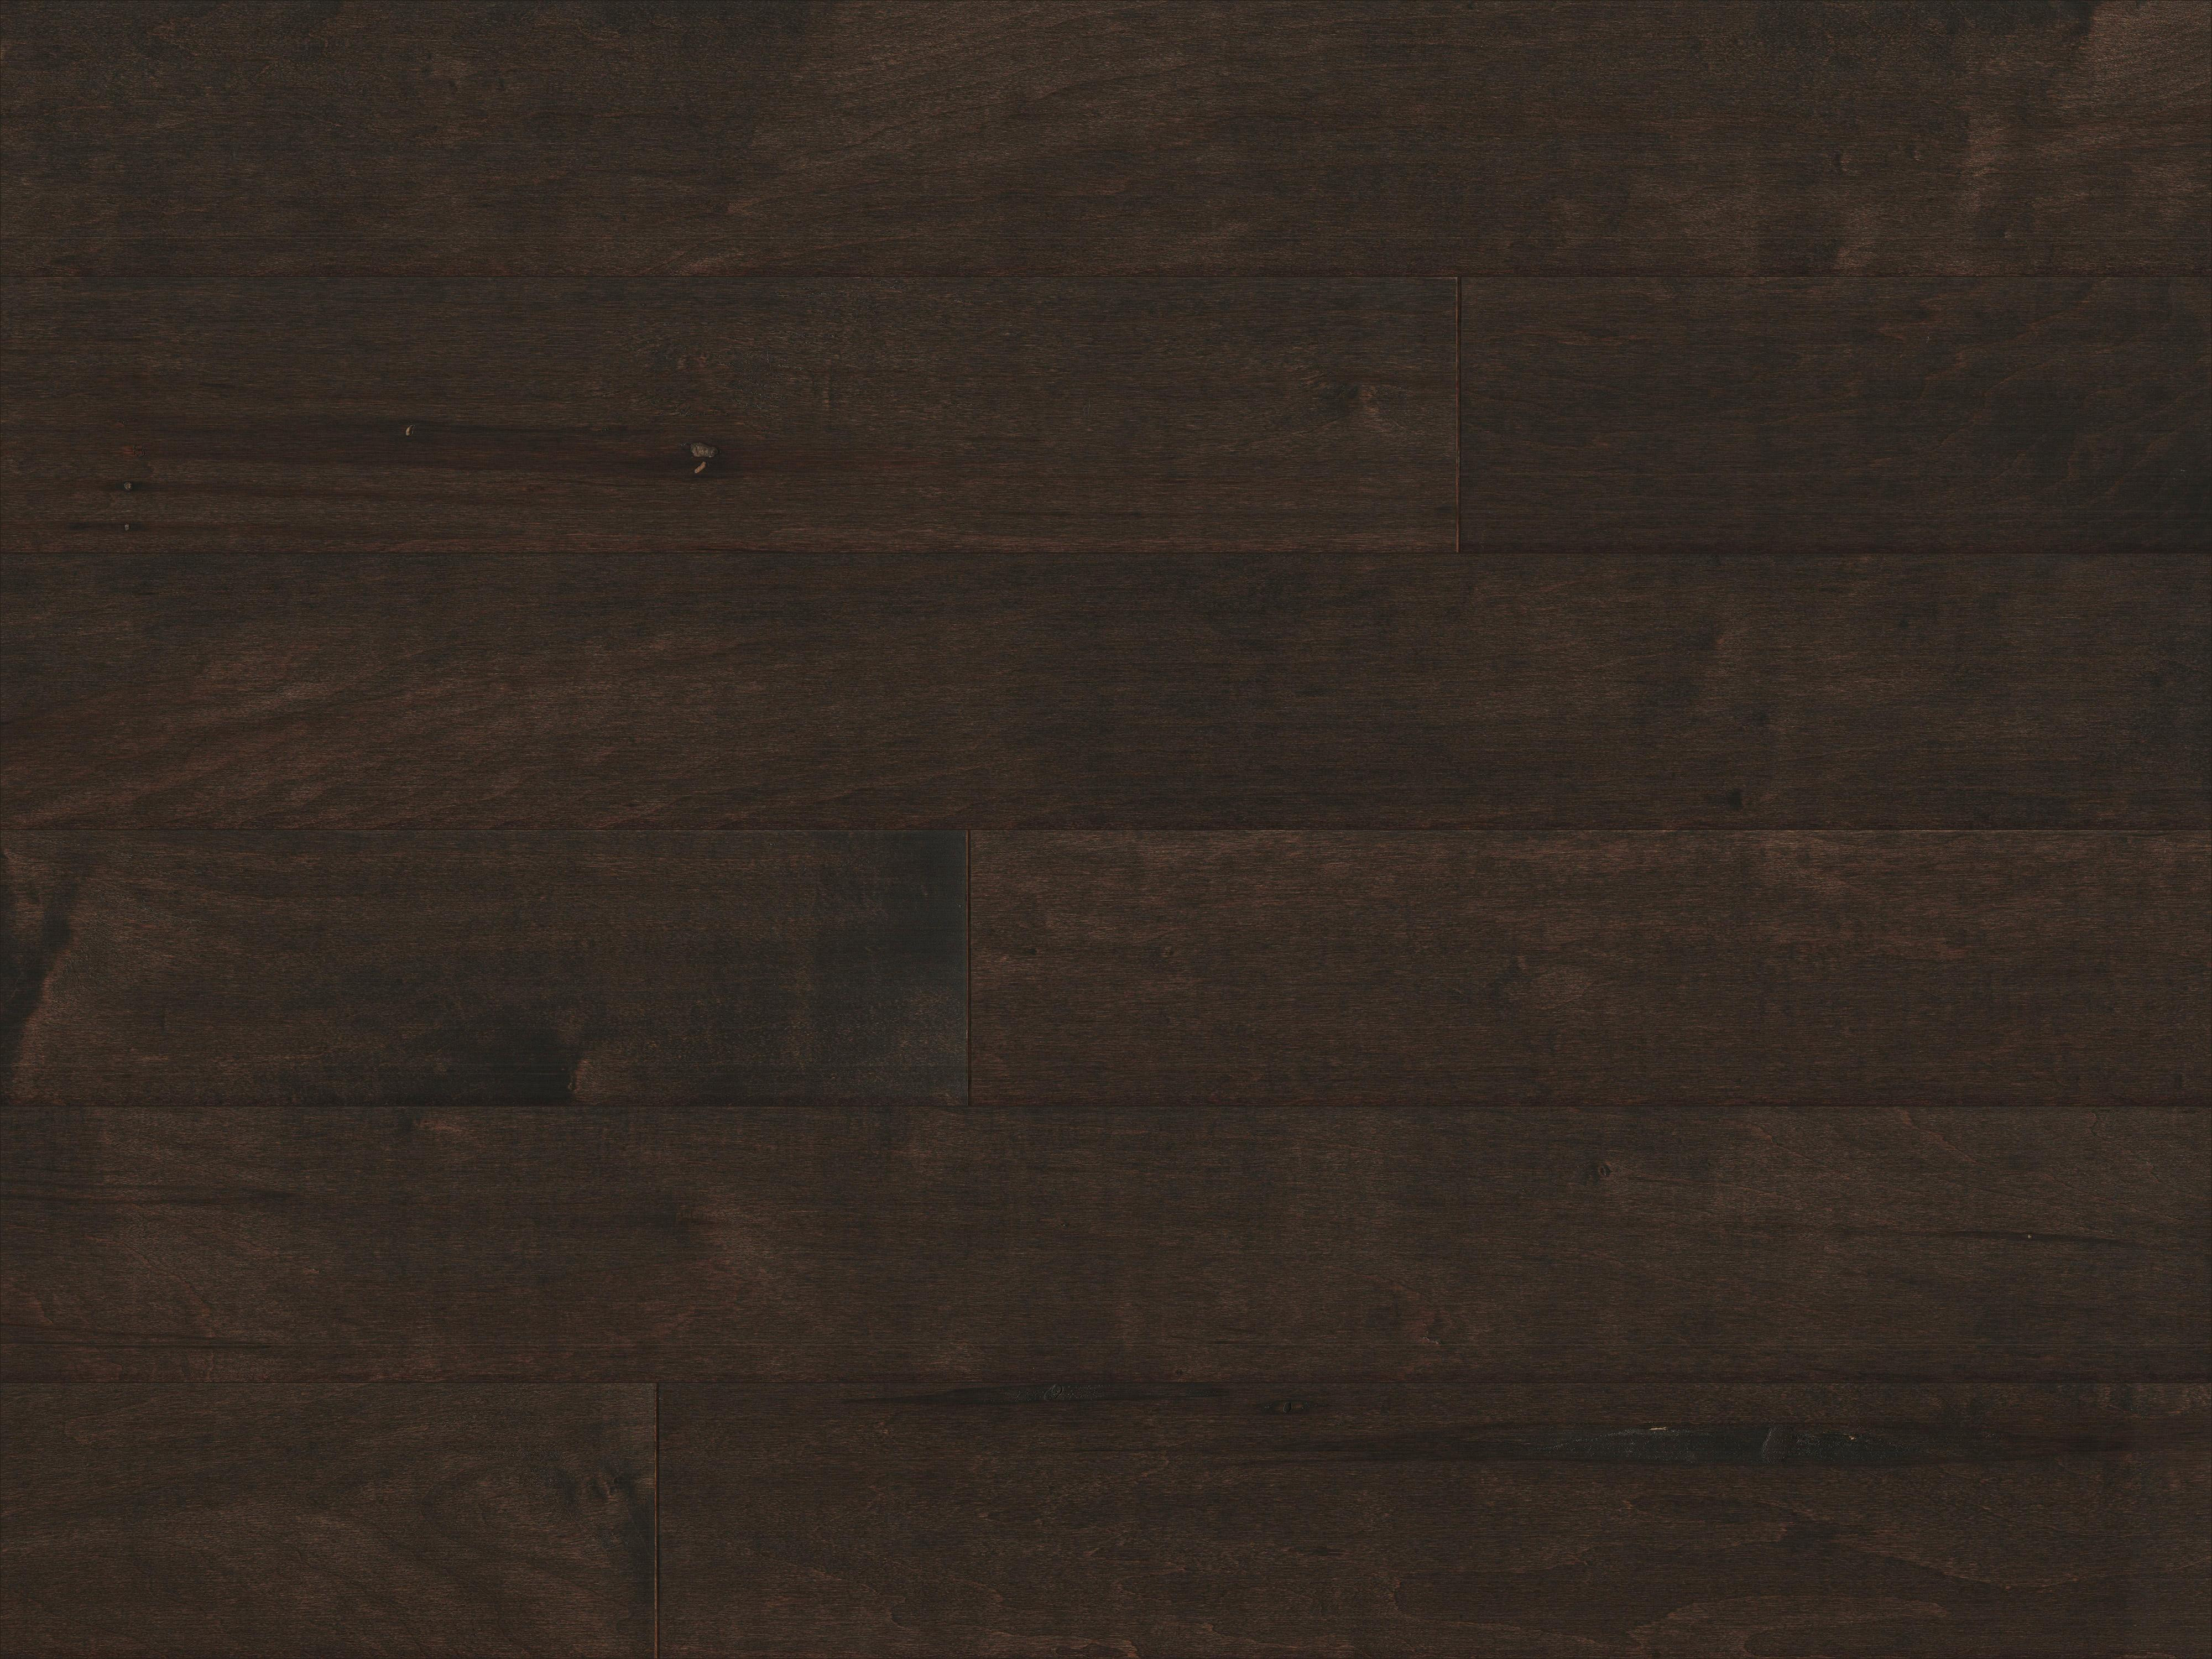 maple amber hardwood flooring of mullican ridgecrest maple cappuccino 1 2 thick 5 wide engineered intended for mullican ridgecrest maple cappuccino 1 2 thick 5 wide engineered hardwood flooring